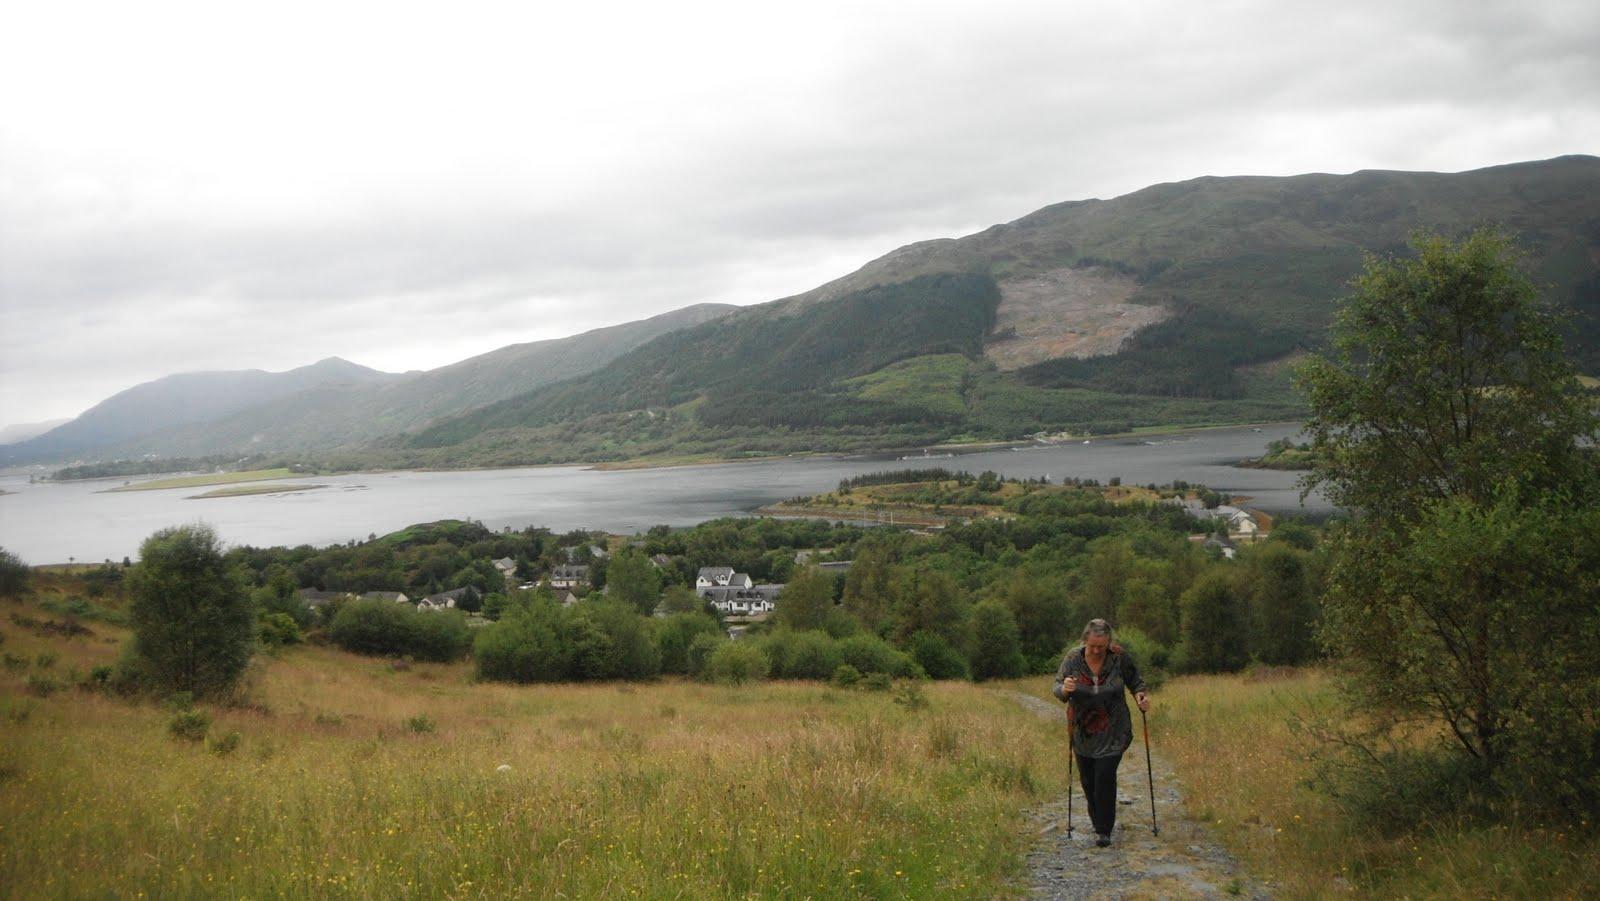 Round the World in 365 days: Wild Camping - SCOTLAND